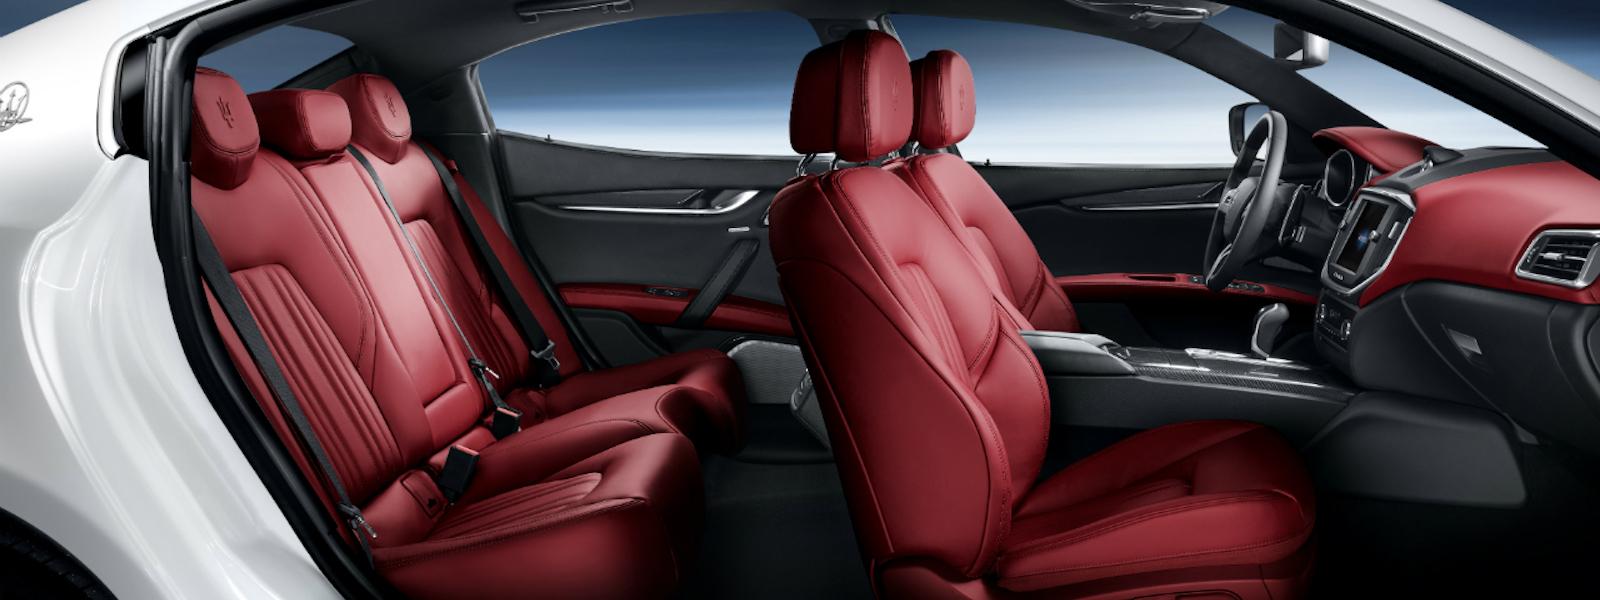 Maserati Ghibli Interior Pic